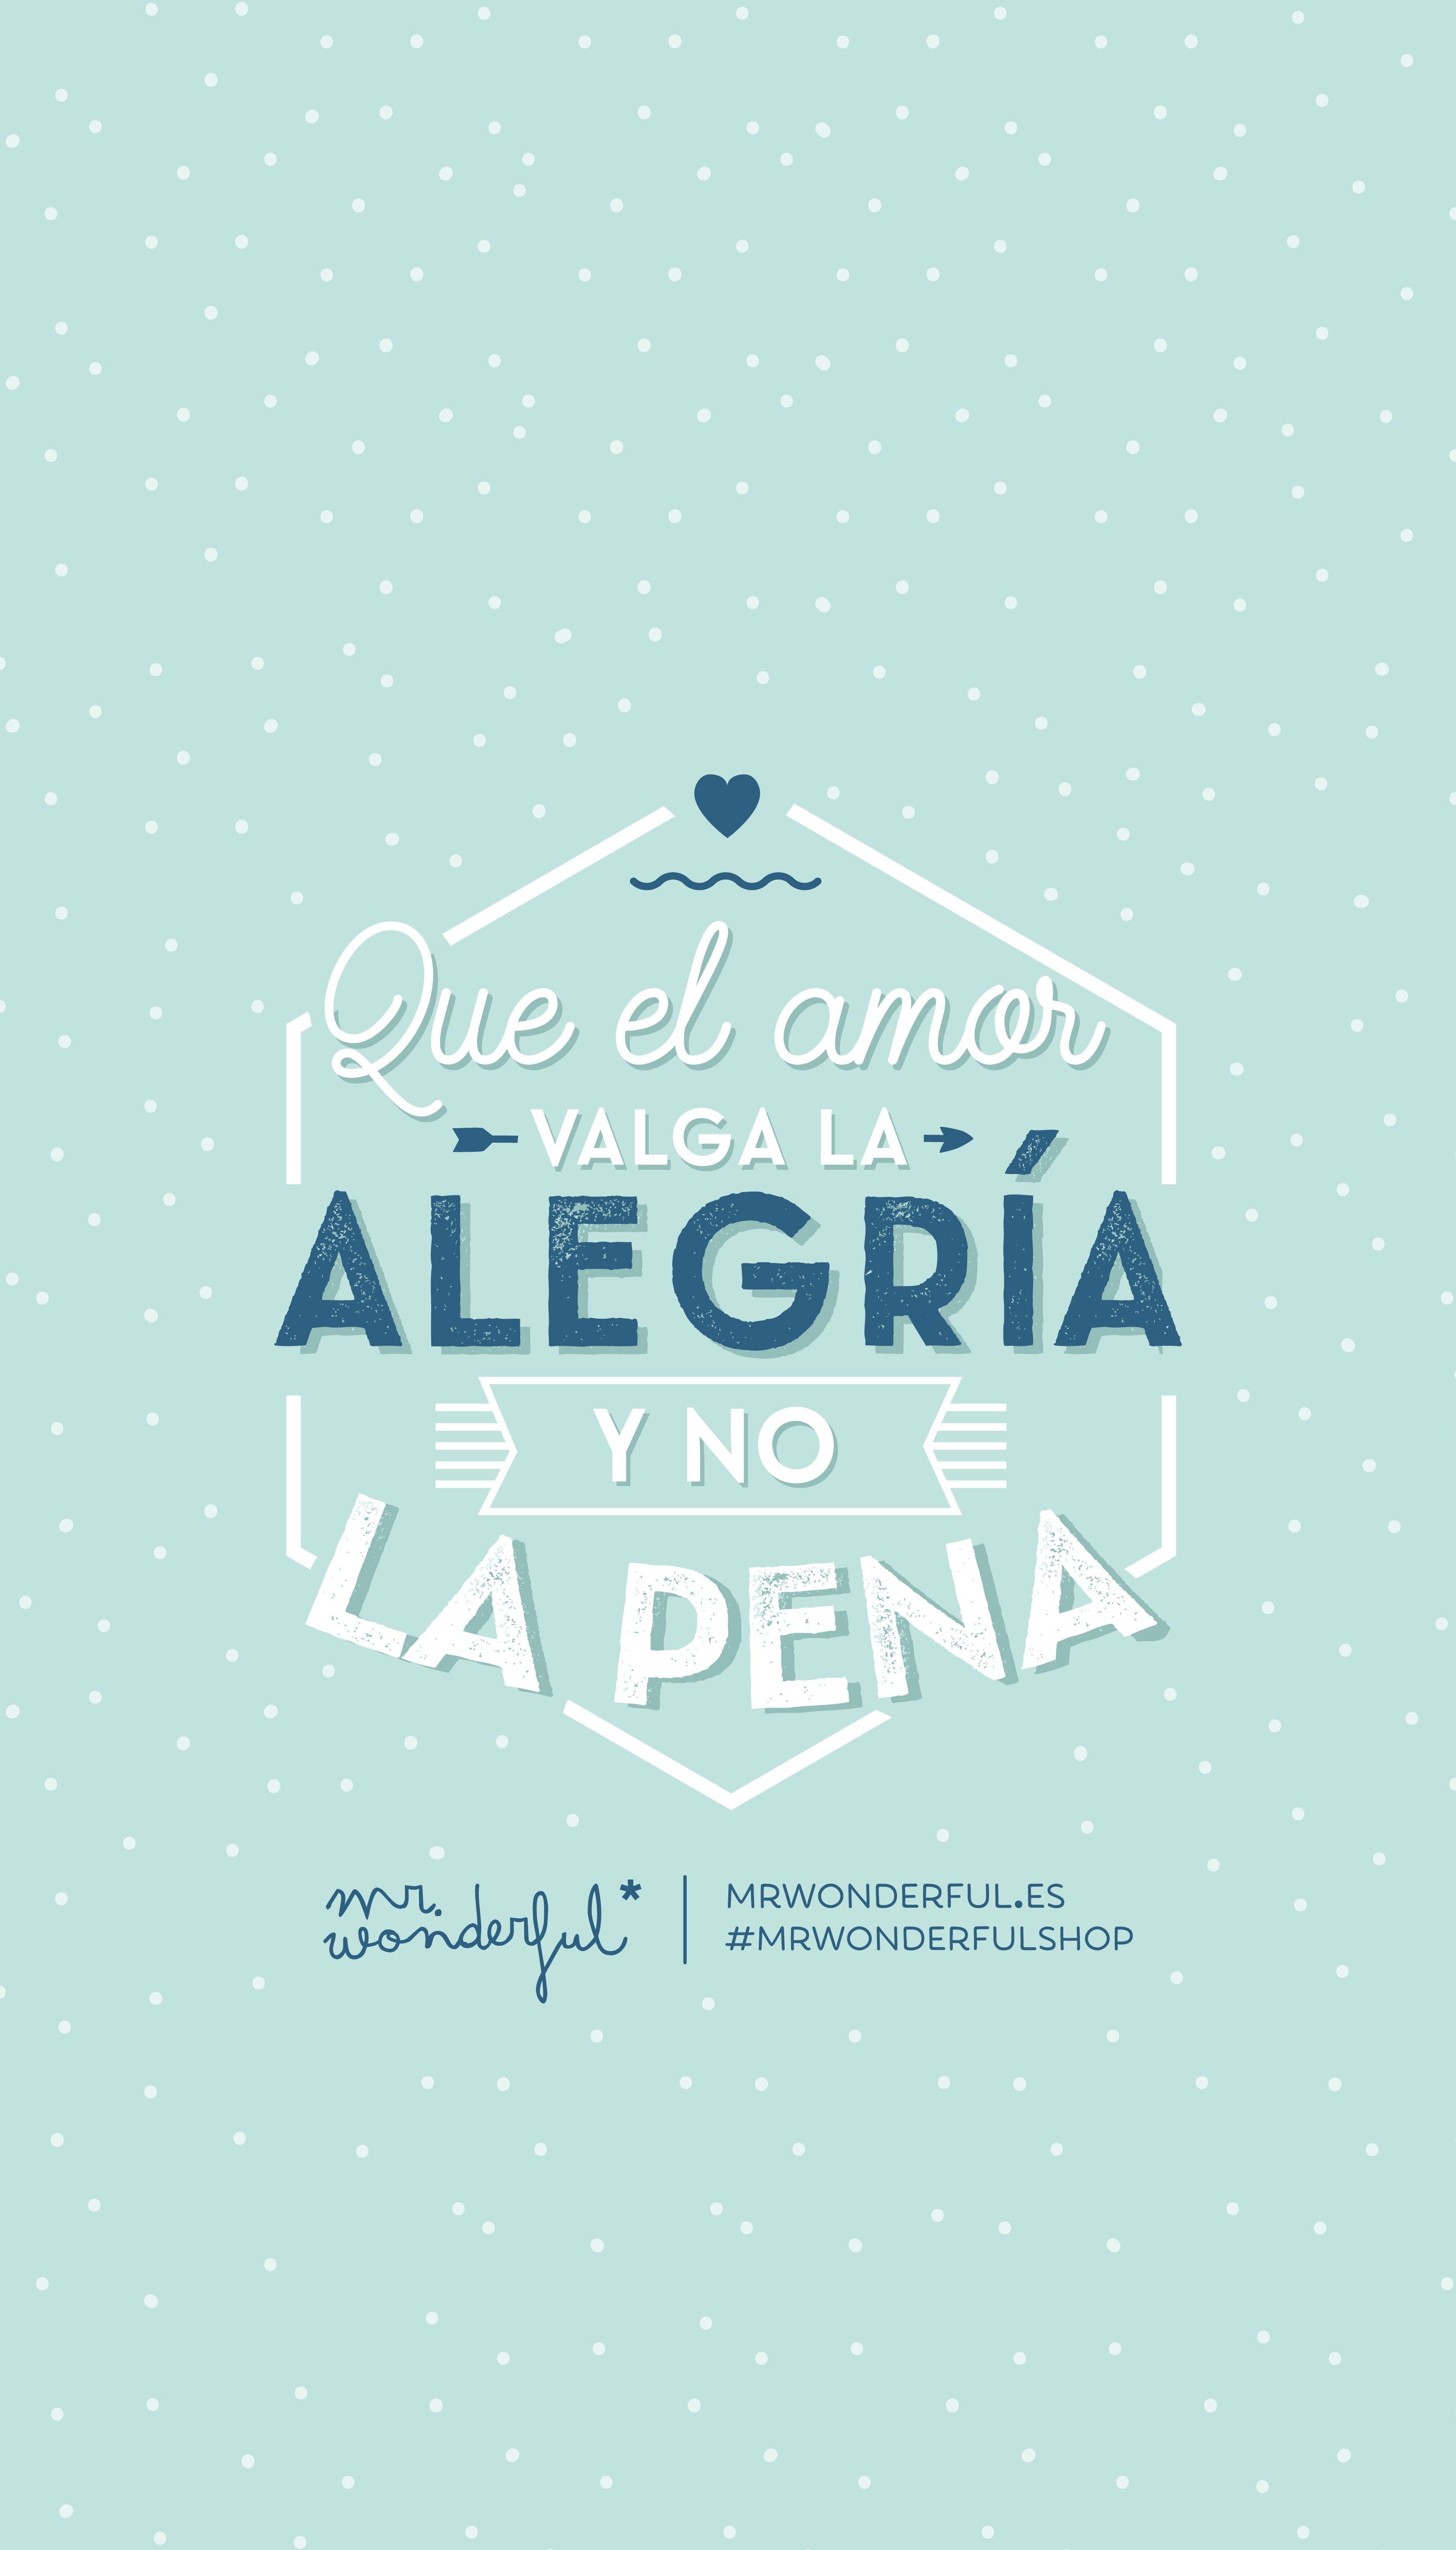 Que el amor valga la ALEGRIA y no la pena another original typography quote and this time it s in Spanish and I m loving it